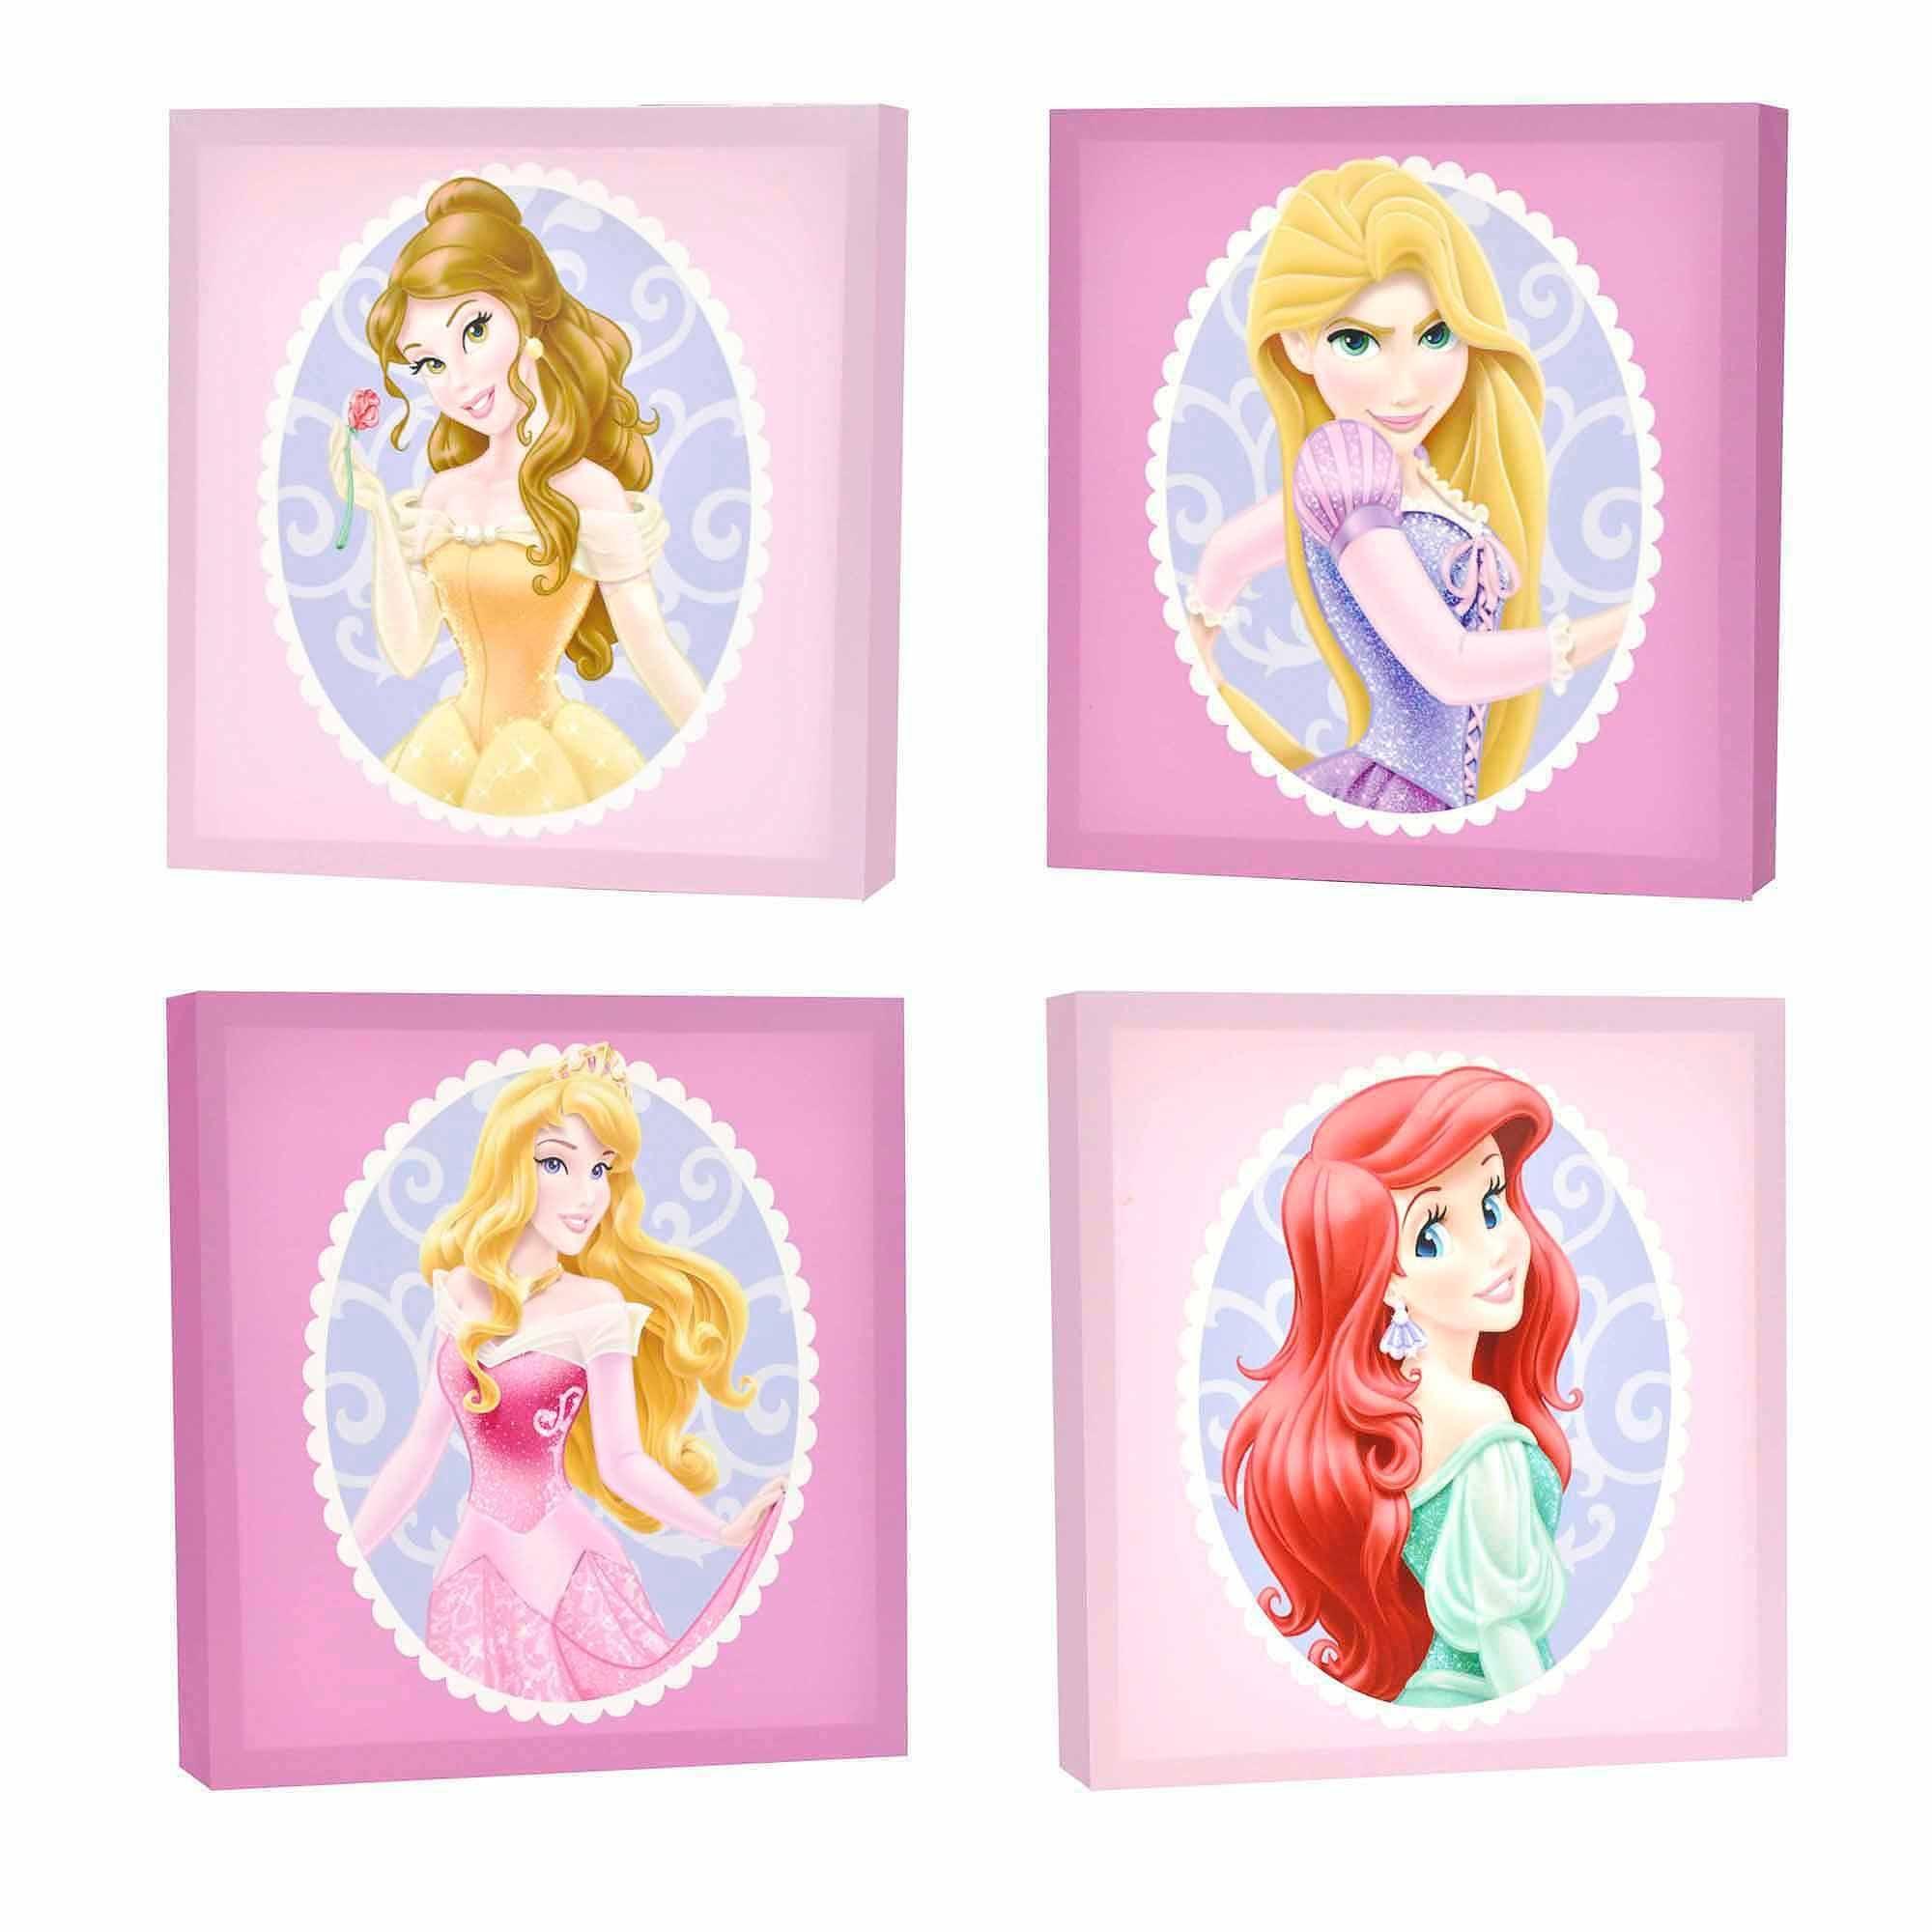 Disney Princess Canvas Wall Art 4 Pc Pack Walmart Com Princess Wall Art Disney Princess Wall Art Canvas Wall Art Set